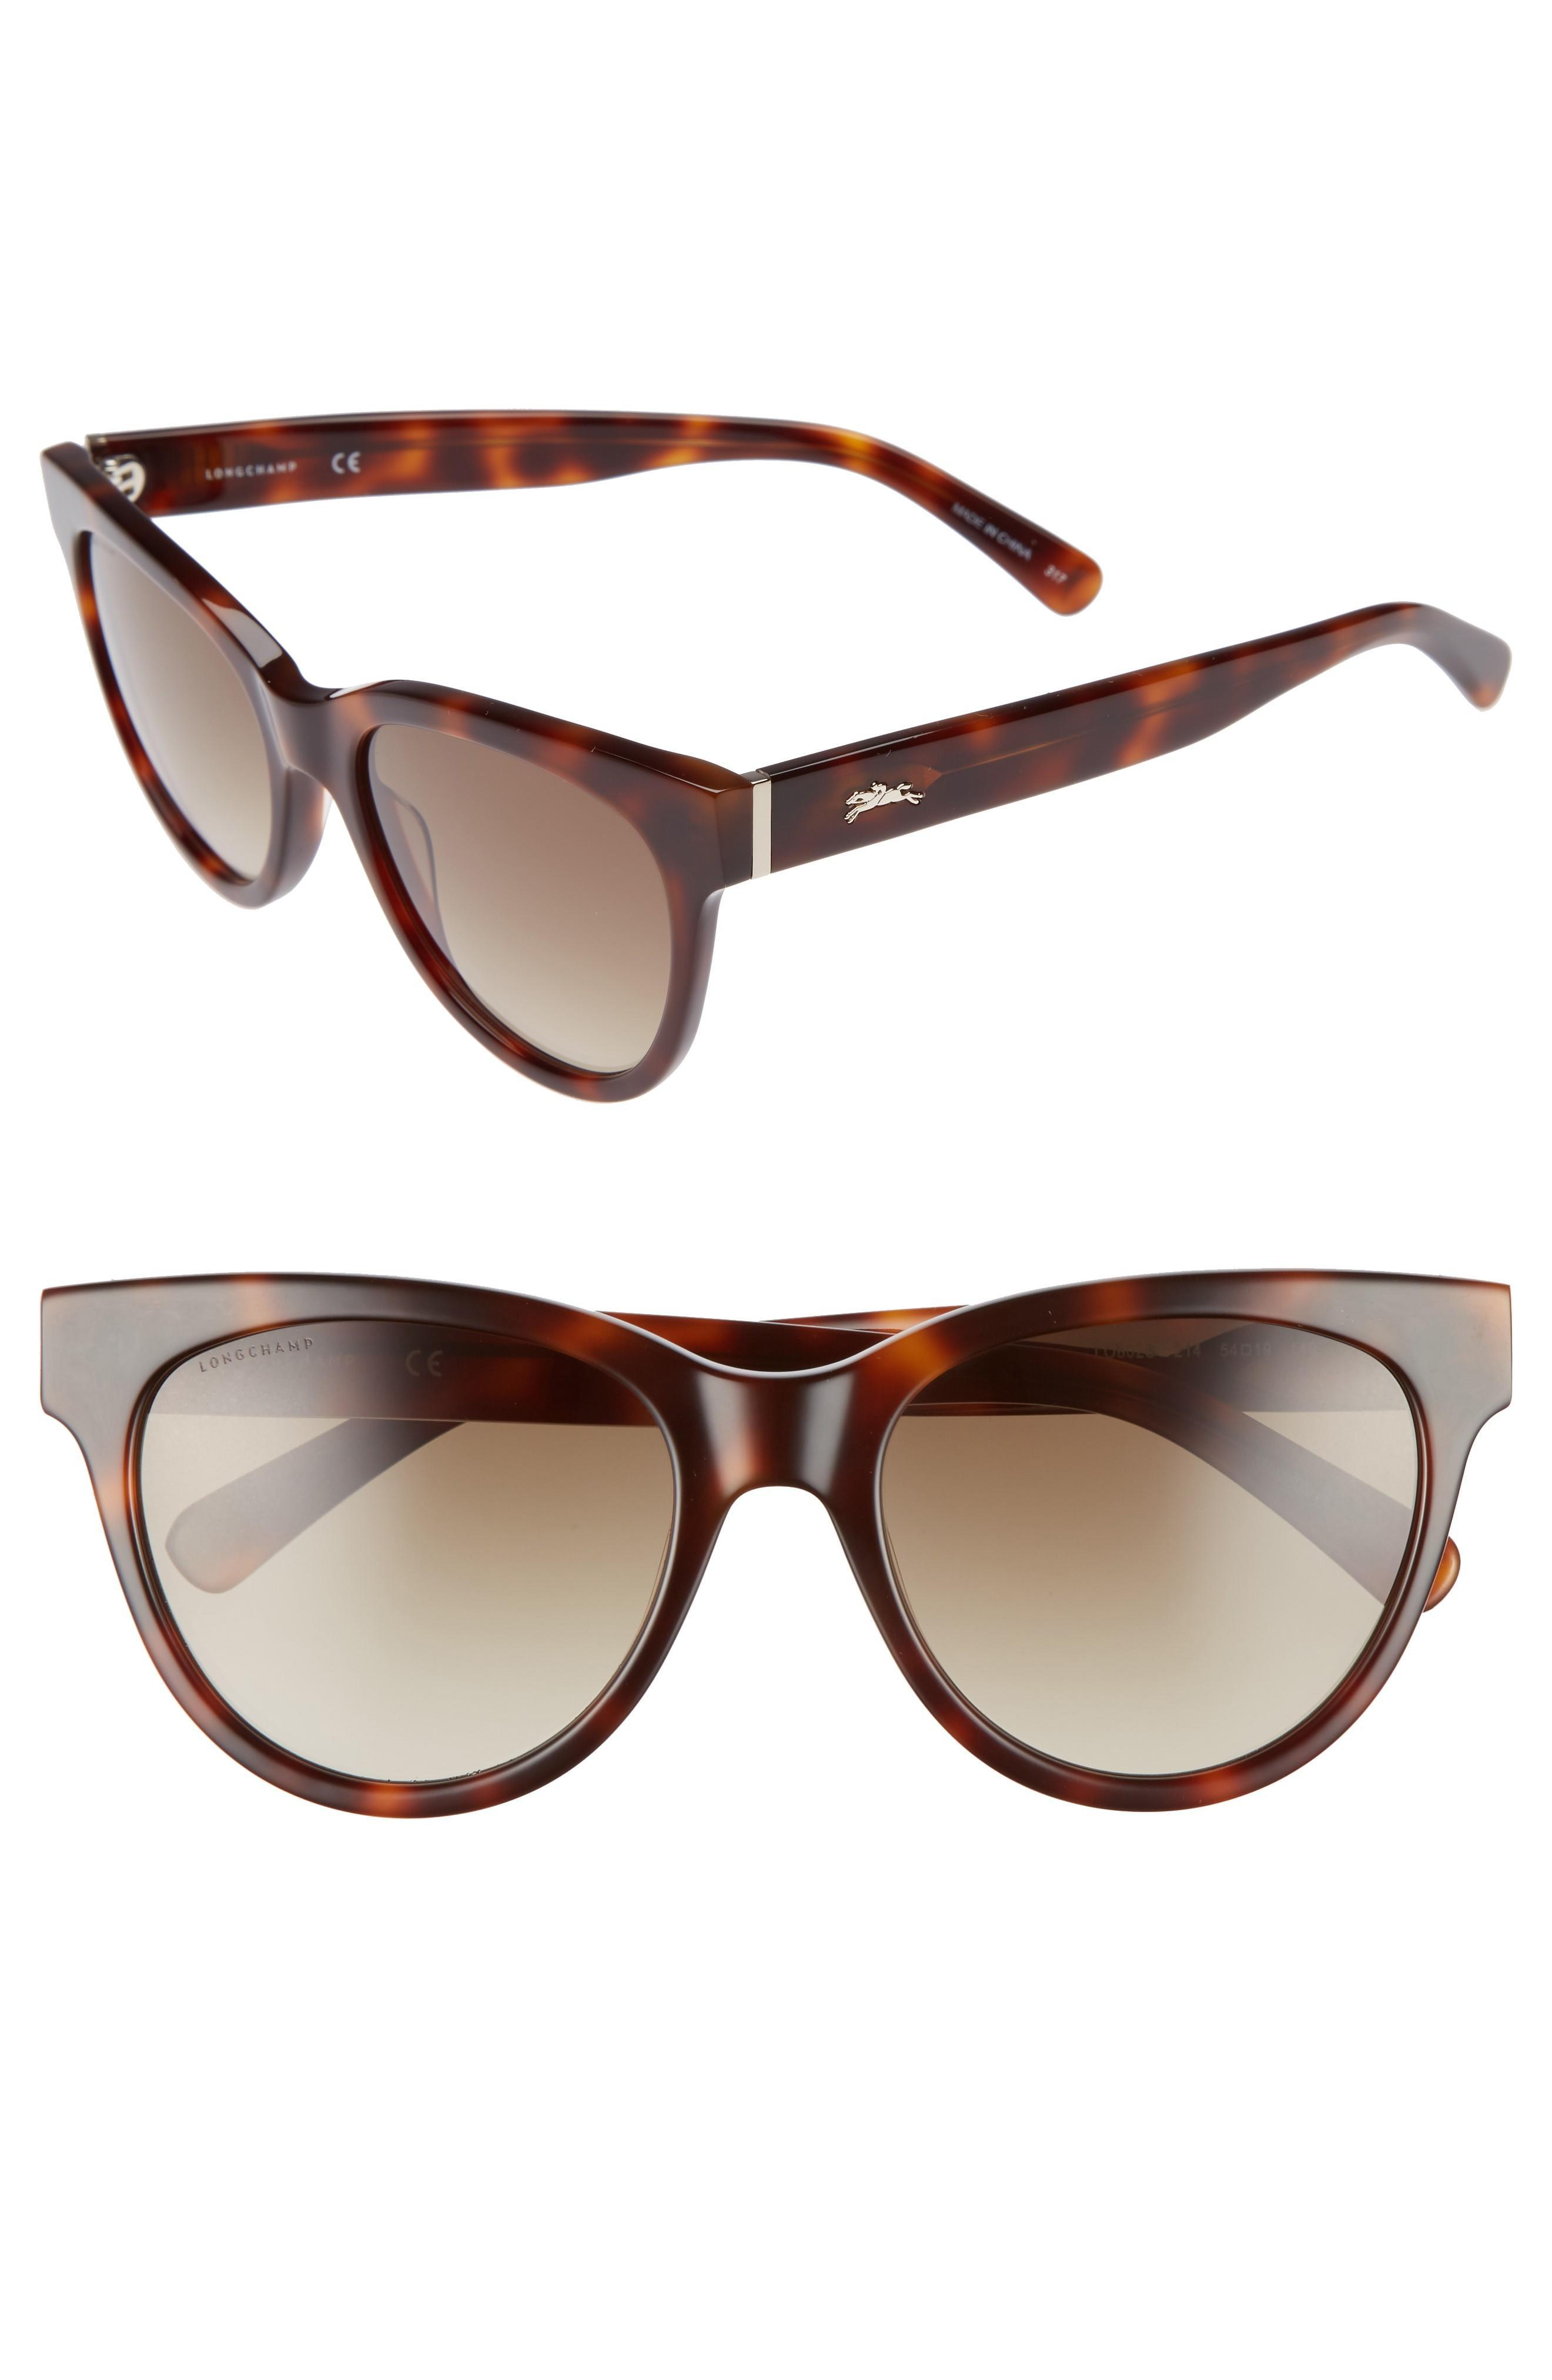 aa4d56fa582 Longchamp 54Mm Gradient Lens Cat Eye Sunglasses - Havana Multi ...